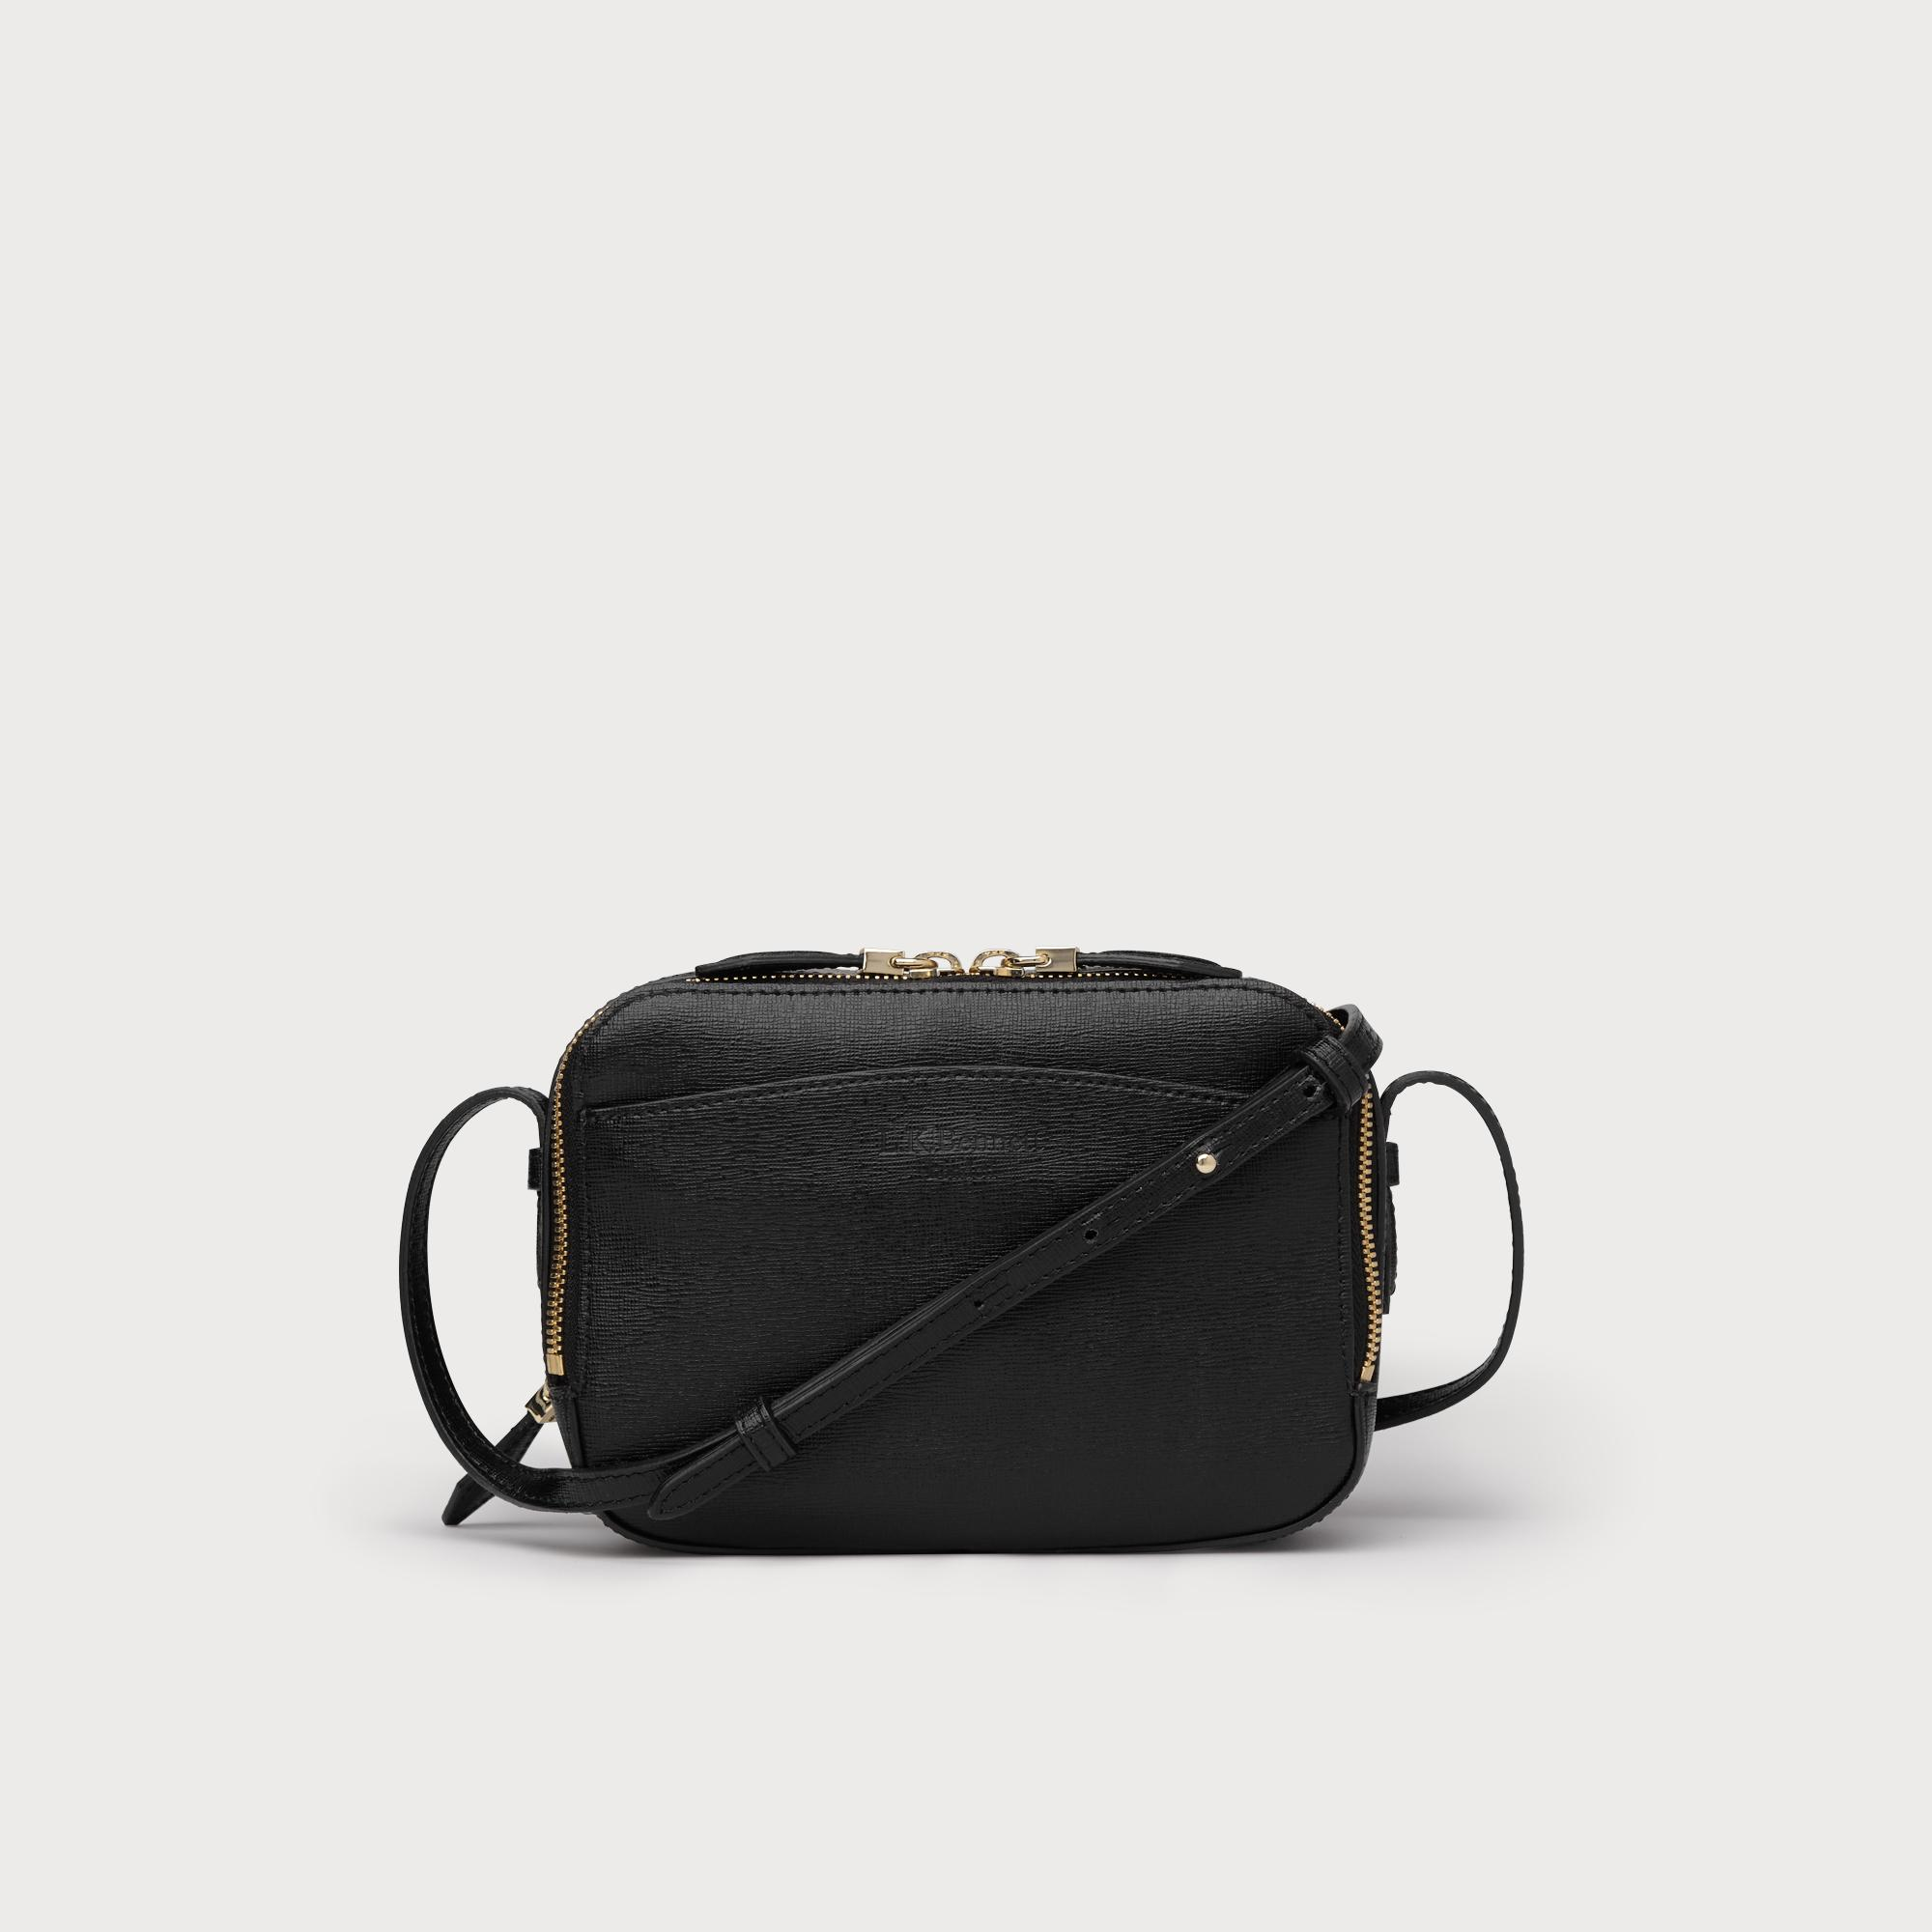 1a36a3c36cd Mariel Black Leather Crossbody Bag